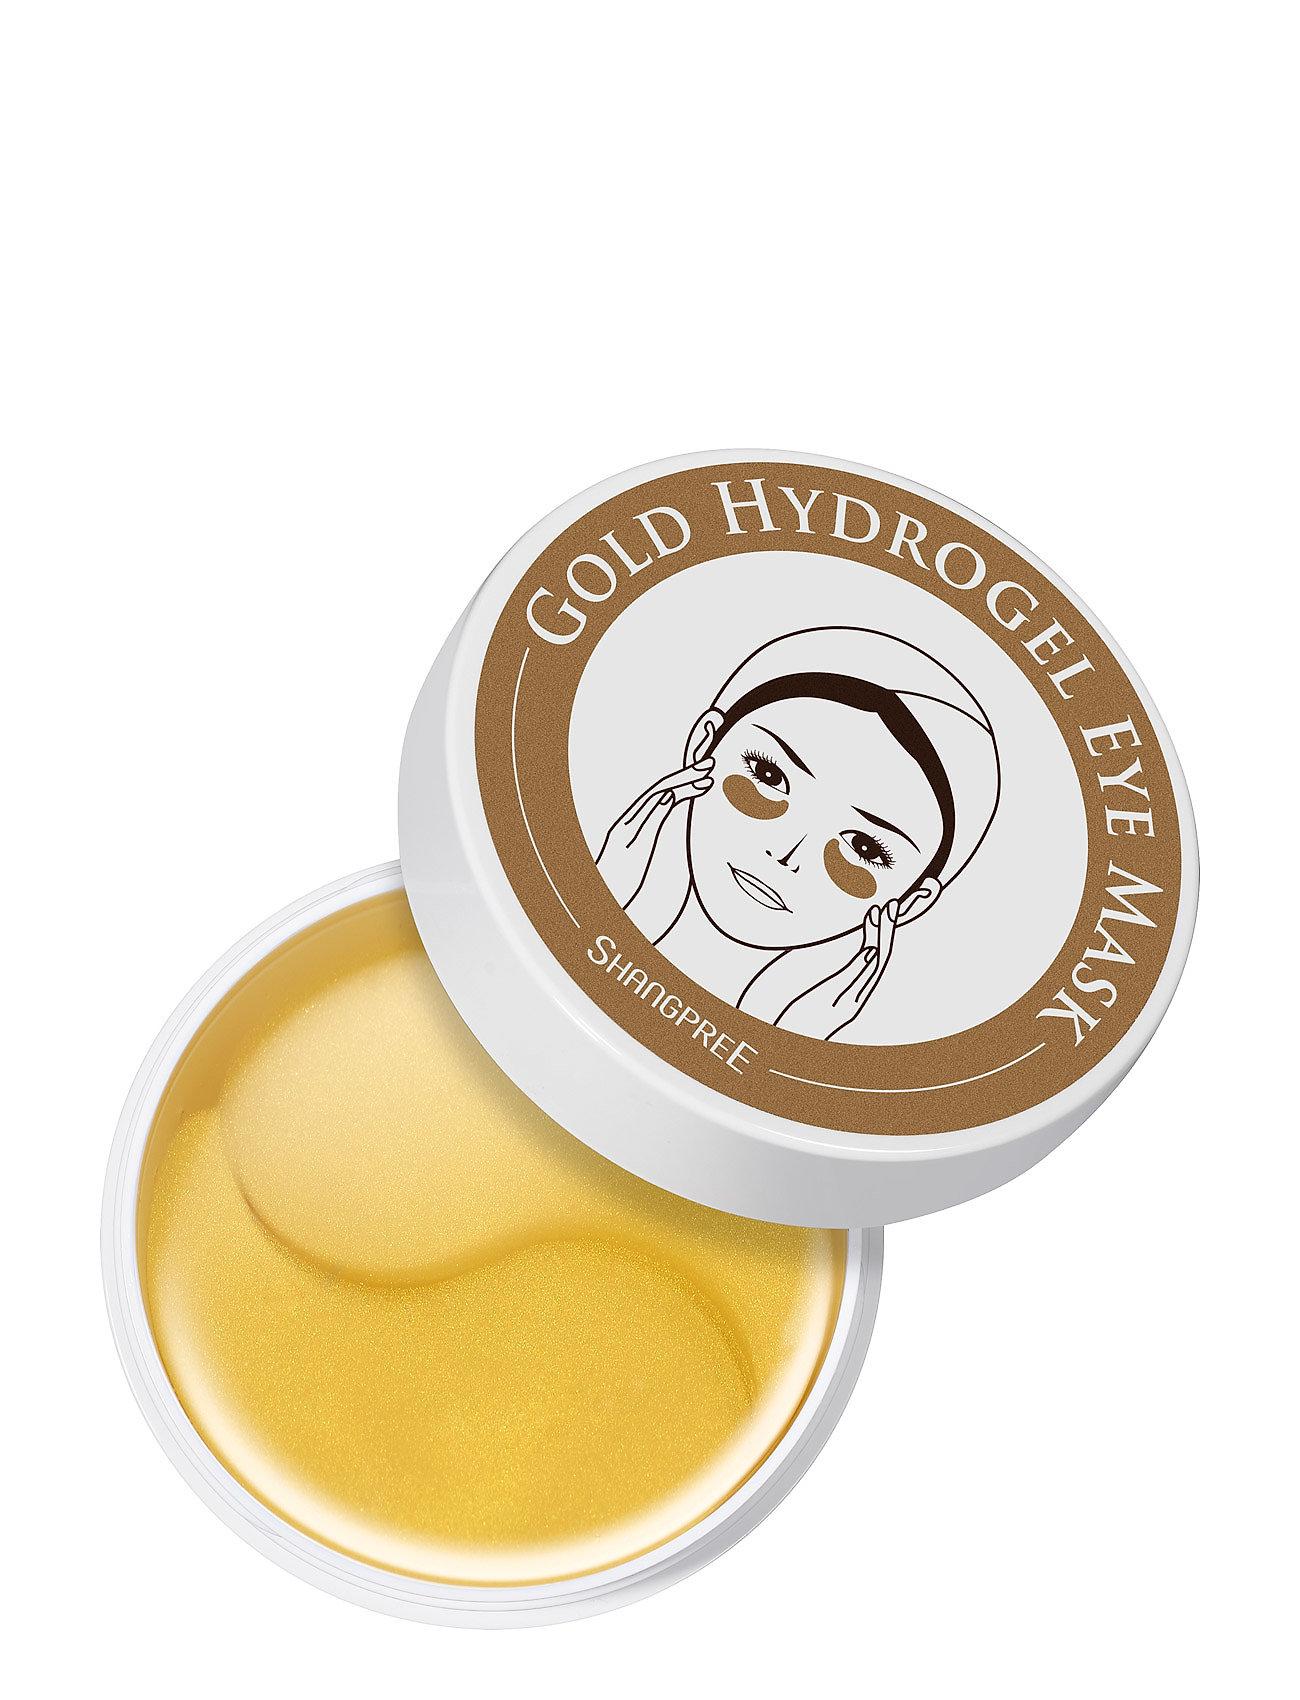 Image of Hydrogel Eye Mask Gold 60 Pcs Beauty WOMEN Skin Care Face Face Masks Guld Shangpree (3297684899)